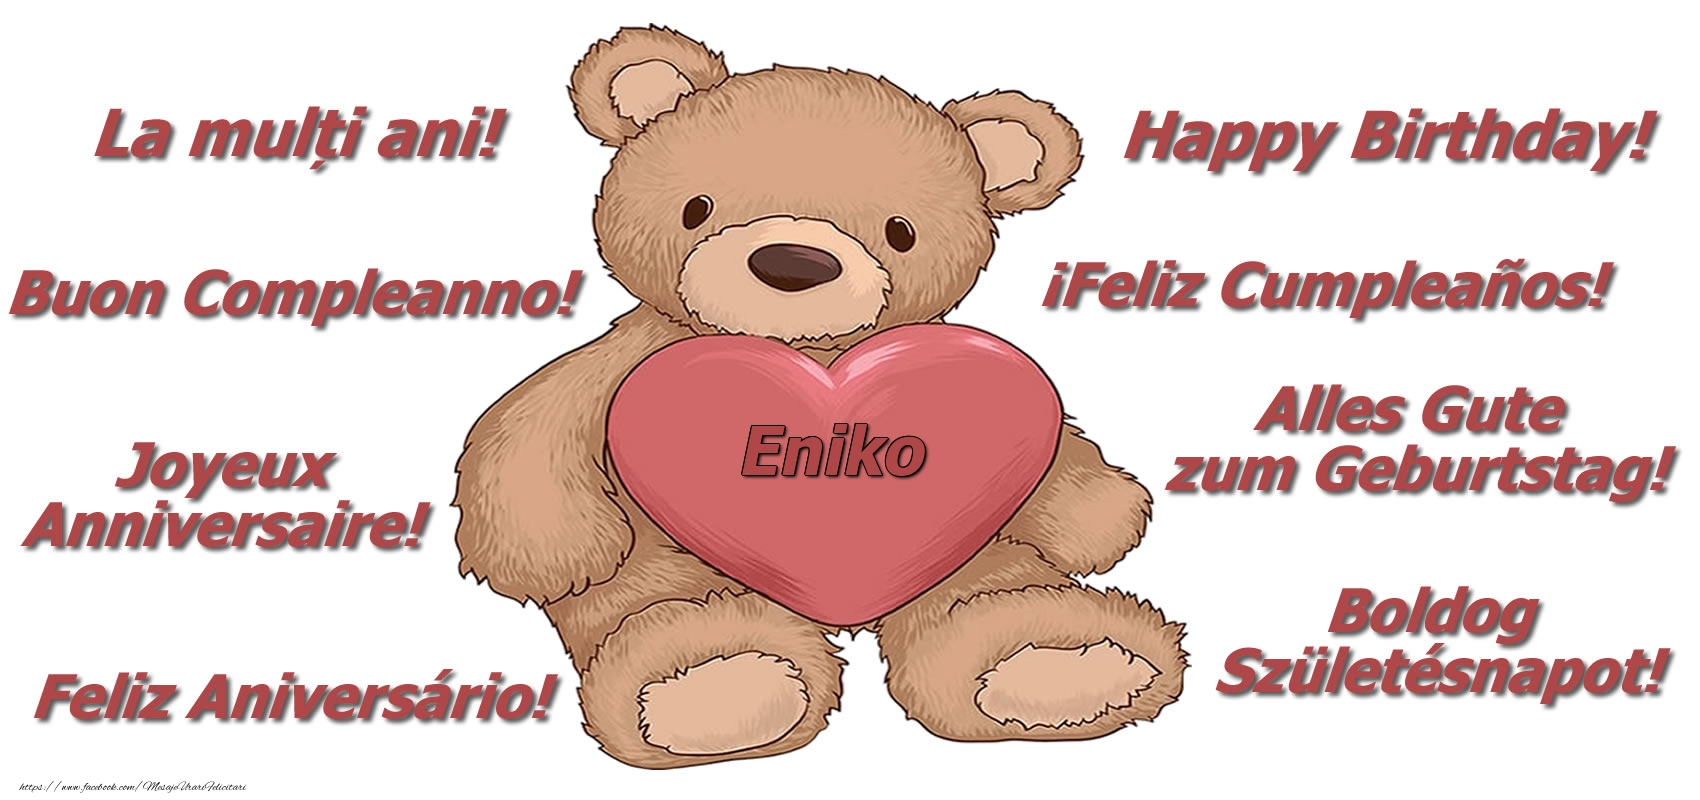 Felicitari de zi de nastere - La multi ani Eniko! - Ursulet